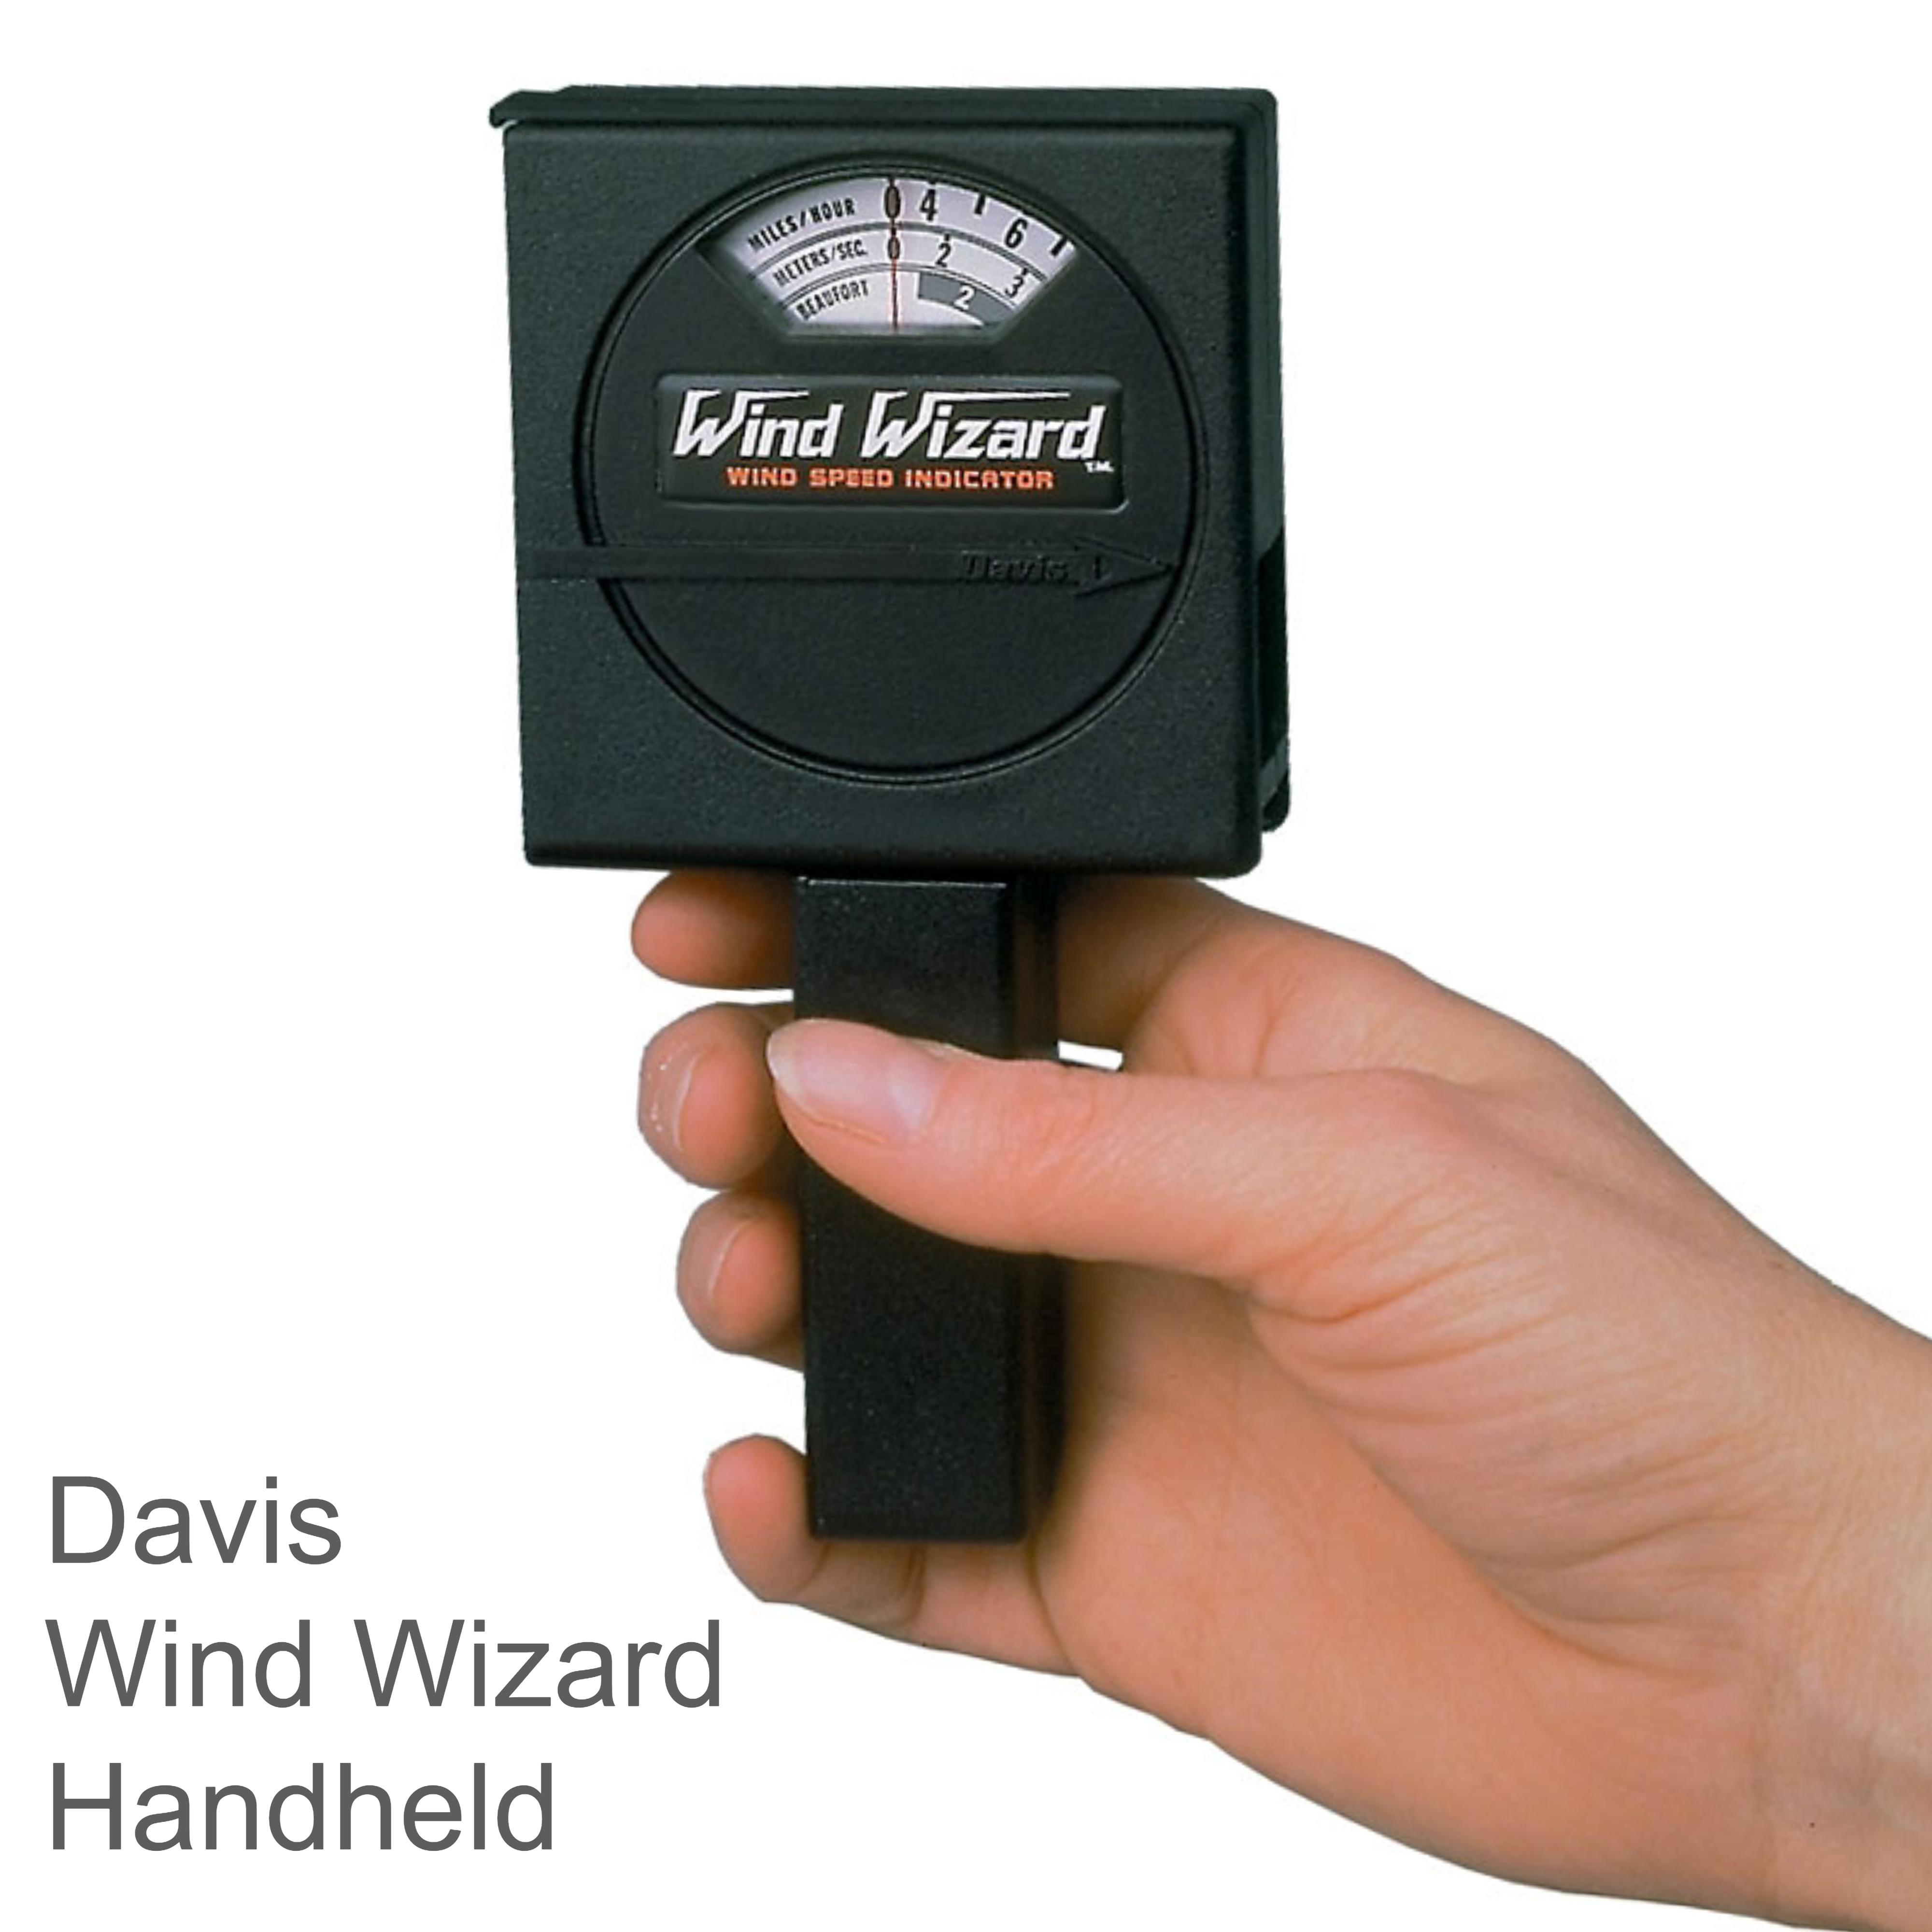 Davis Wind Wizard Handheld Wind - Speed Indicator|Measures Wind speed 0-60 mph